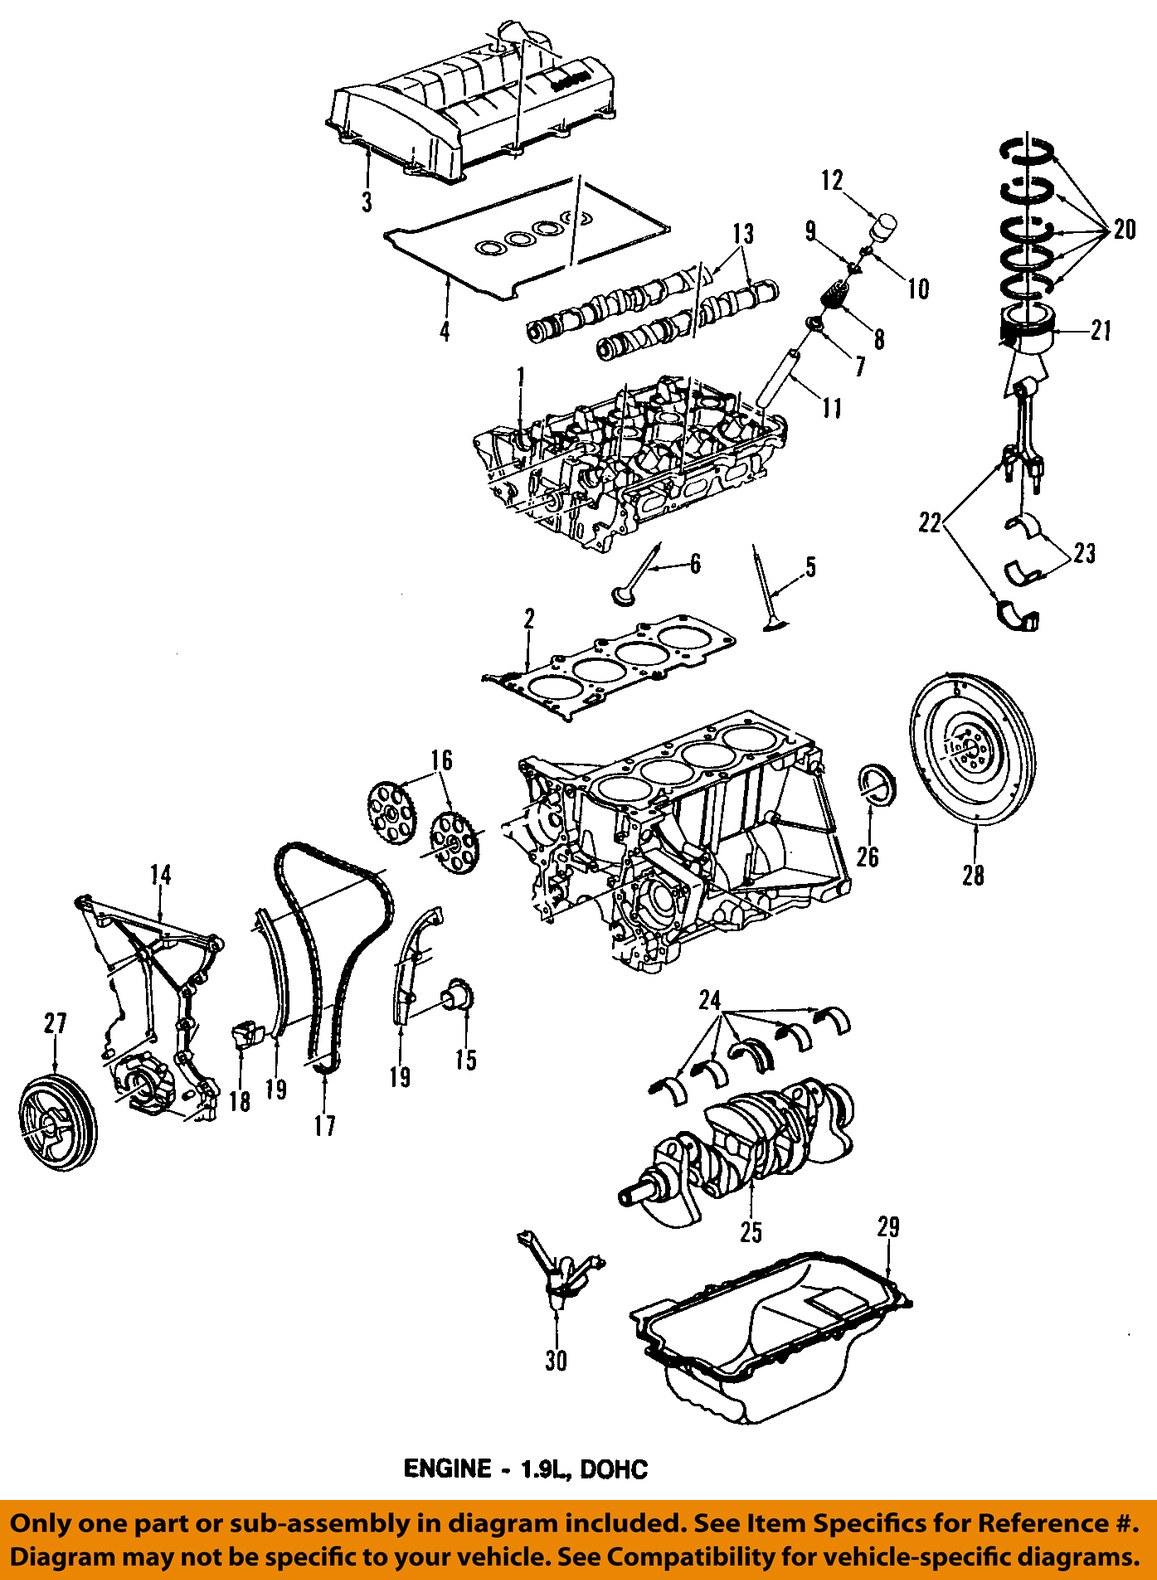 98 saturn sl2 engine diagram 1997 saturn sl2 engine diagram saturn gm oem 96 98 sl2 engine valve cover 21007151 ebay